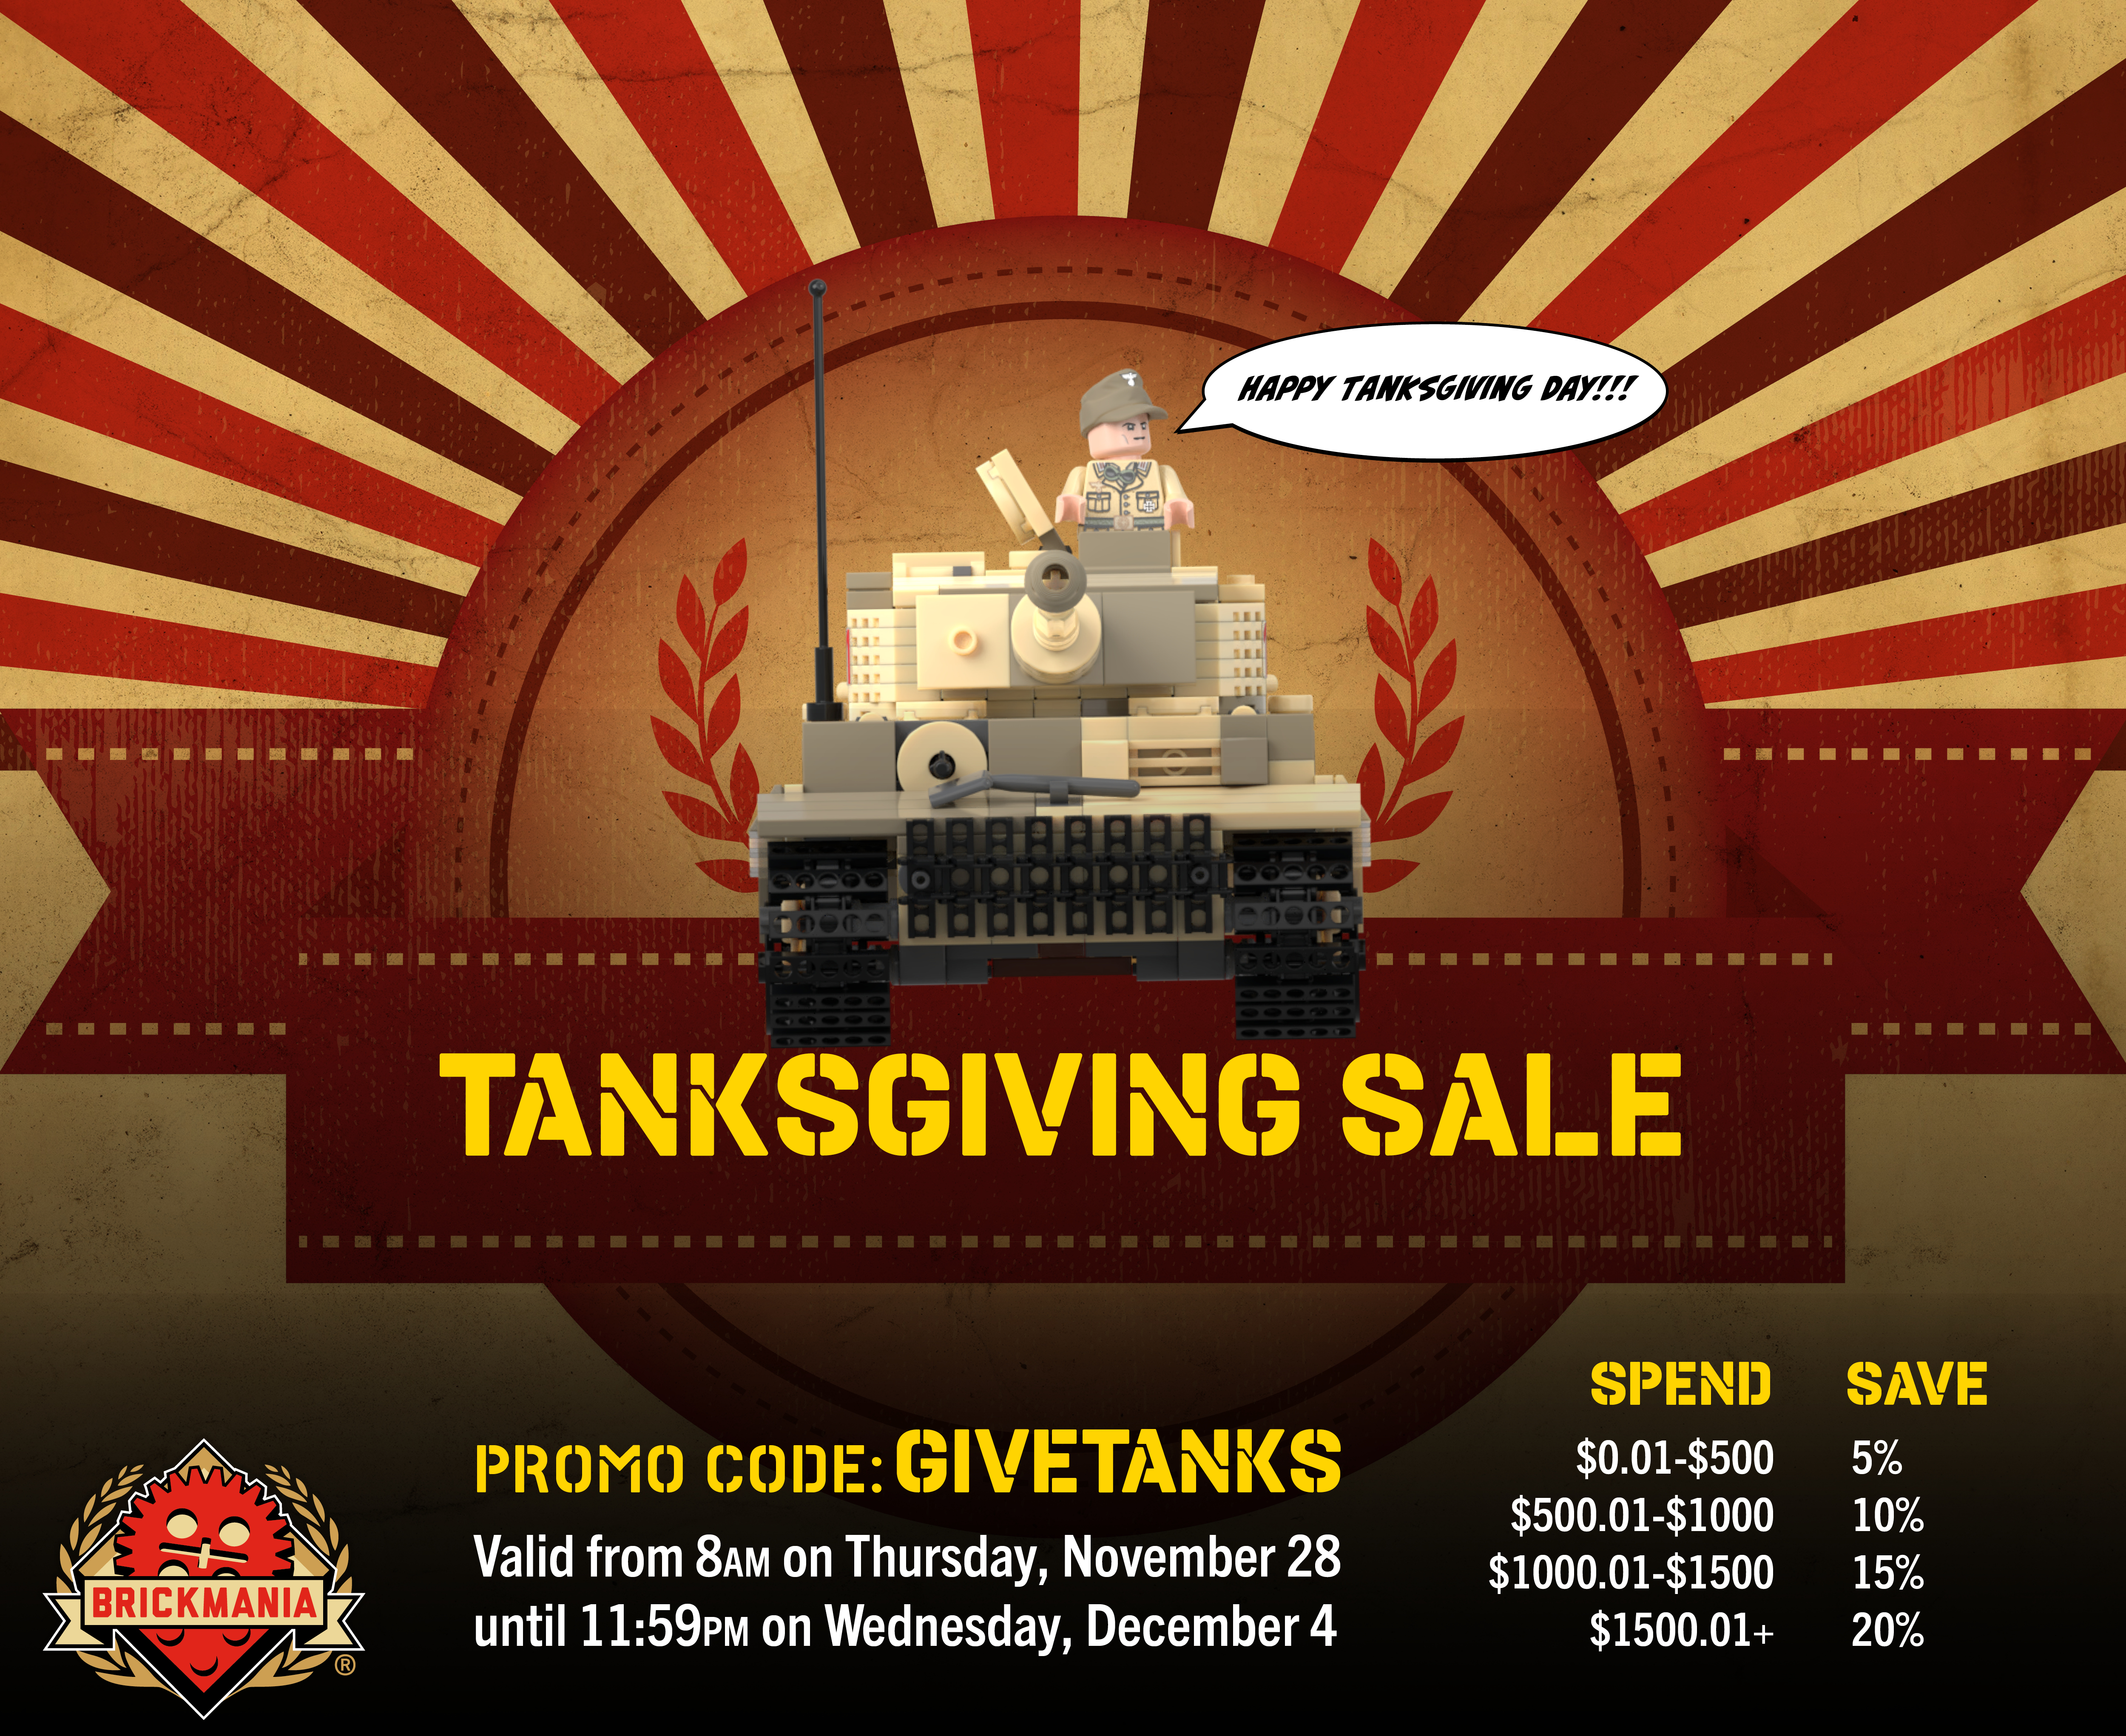 Tanksgiving_1200x980_digital